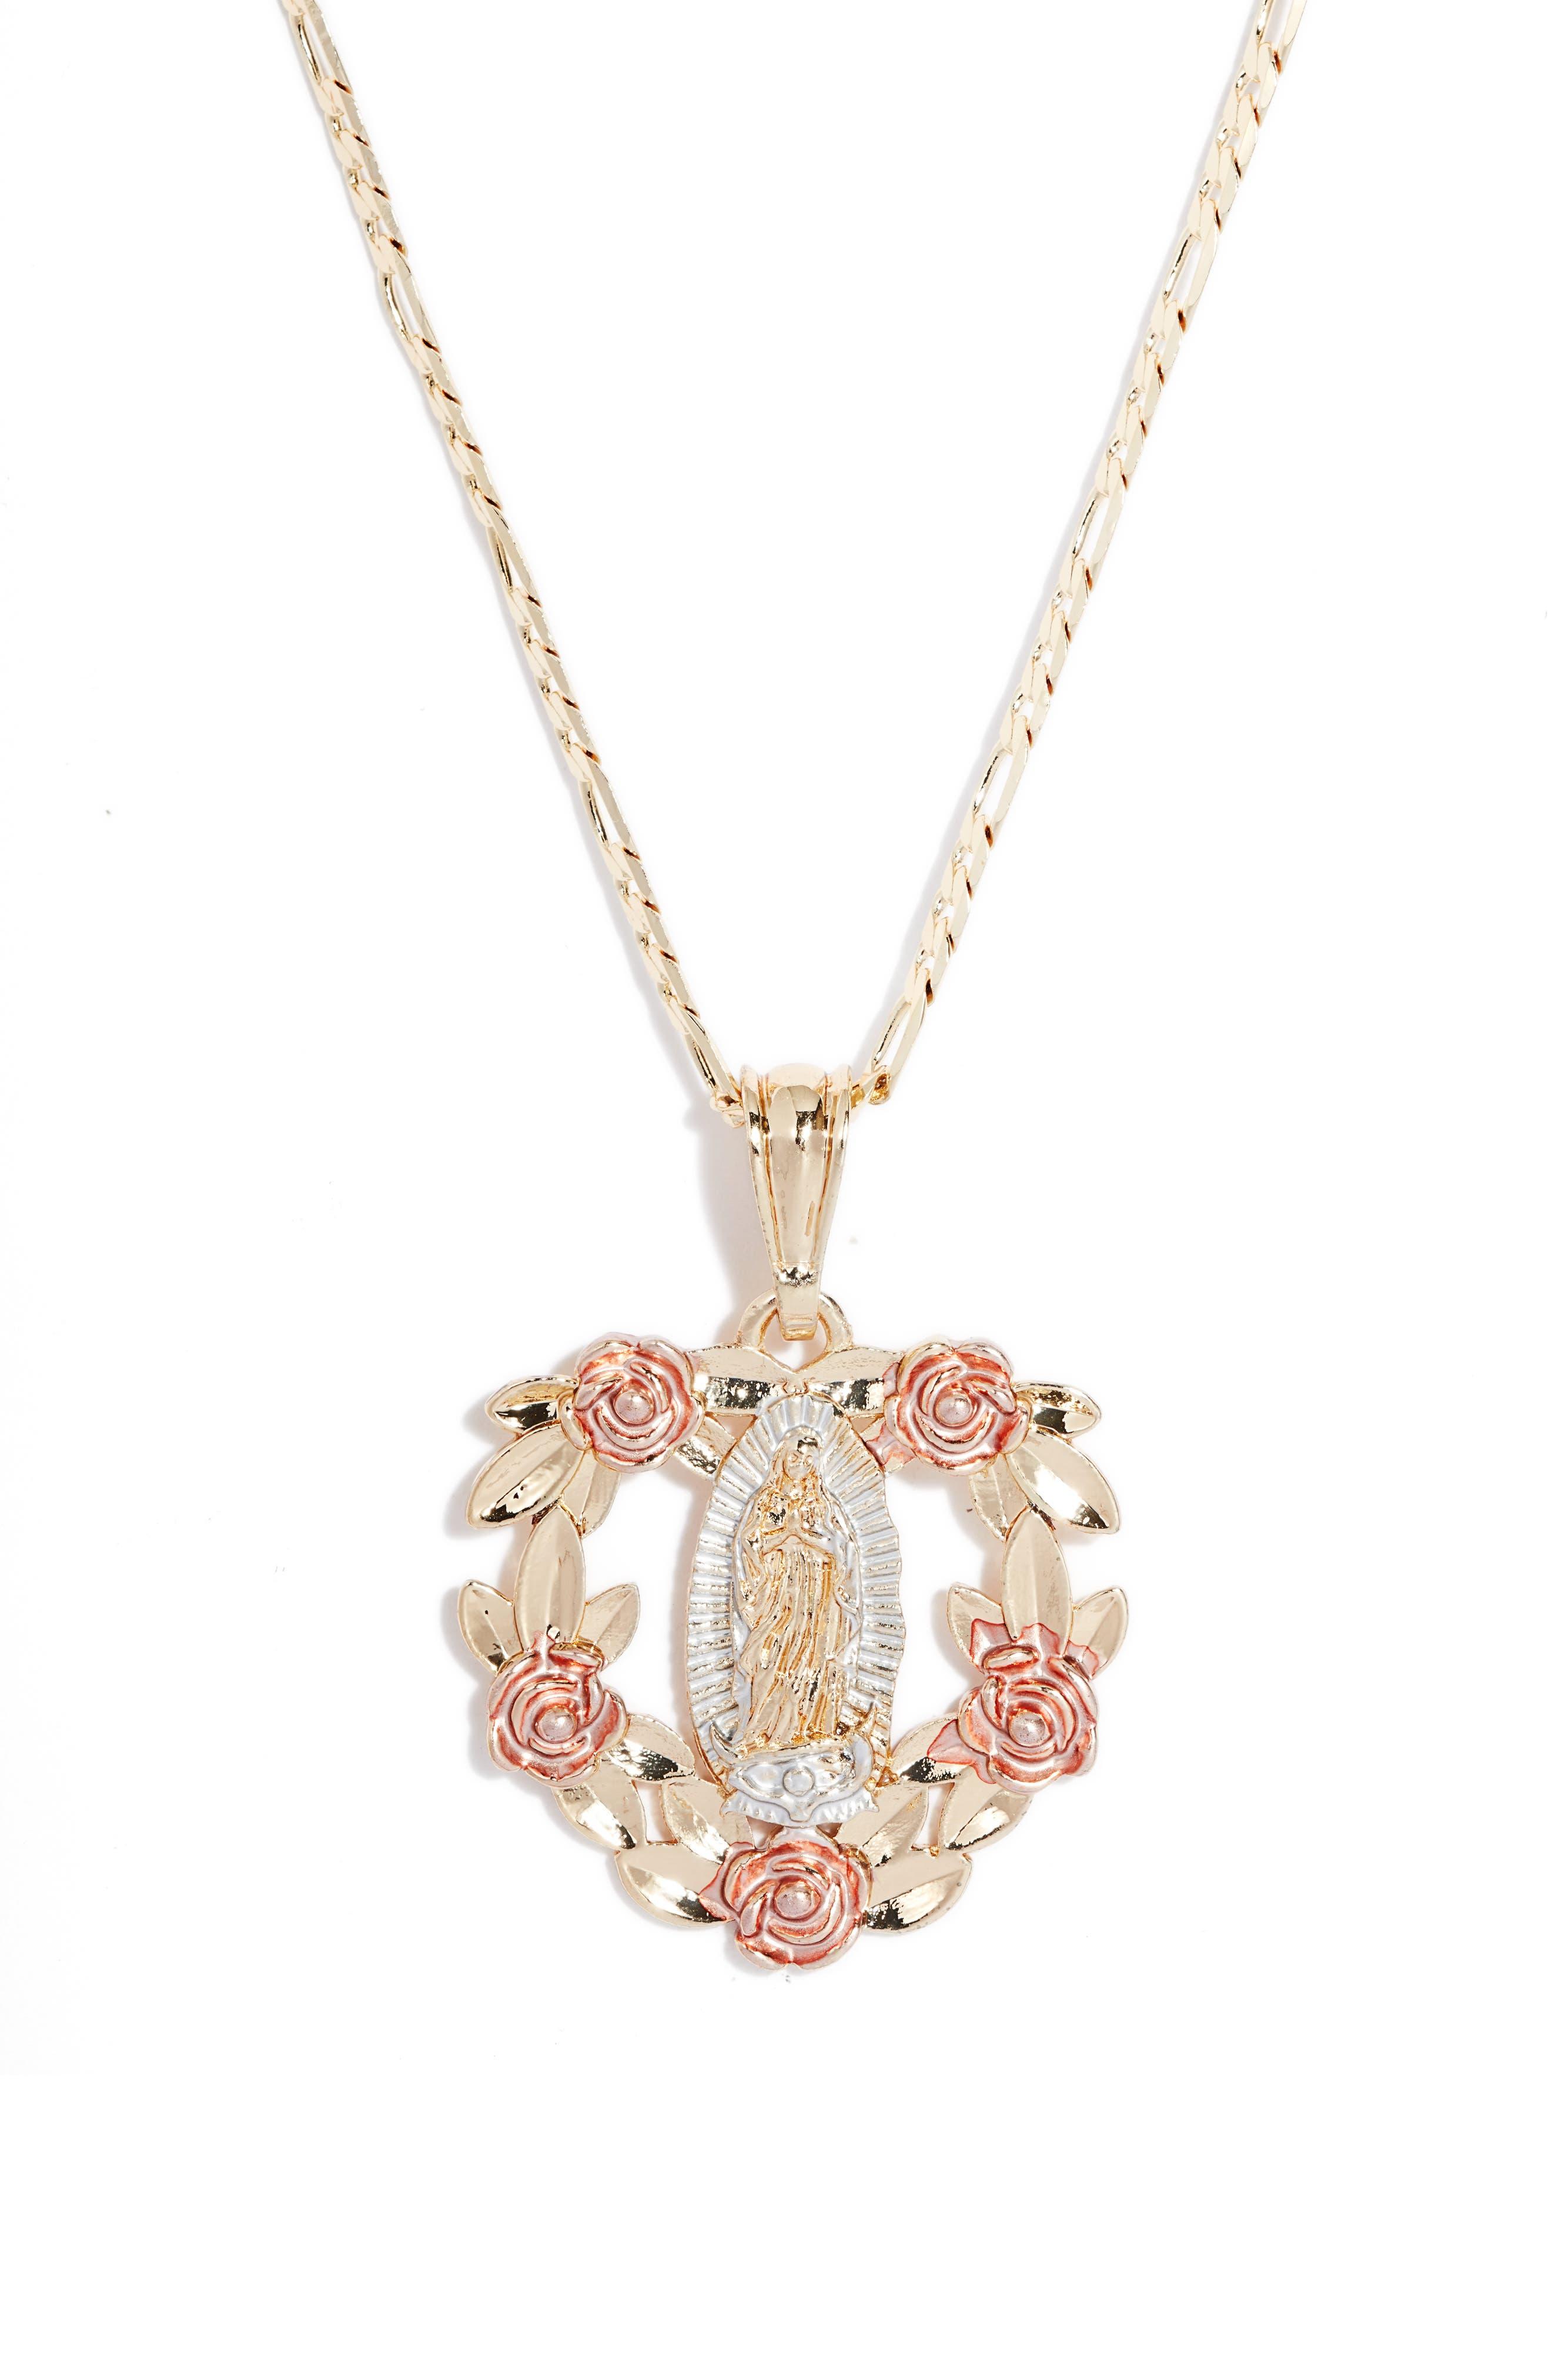 Virgin Mary Heart Bouquet Pendant Necklace